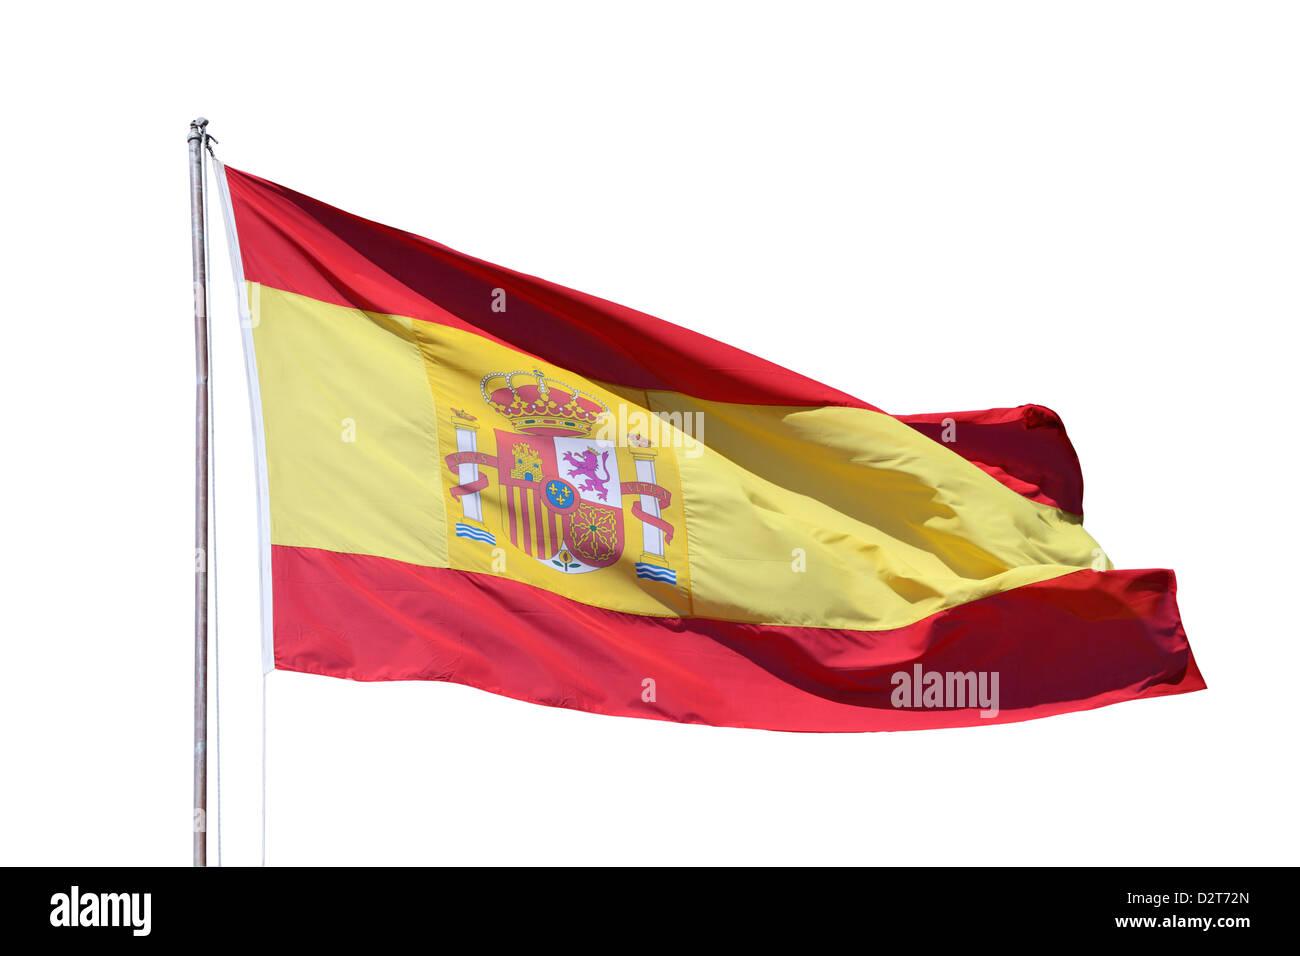 Spanish national flag isoliert over white background - Stock Image